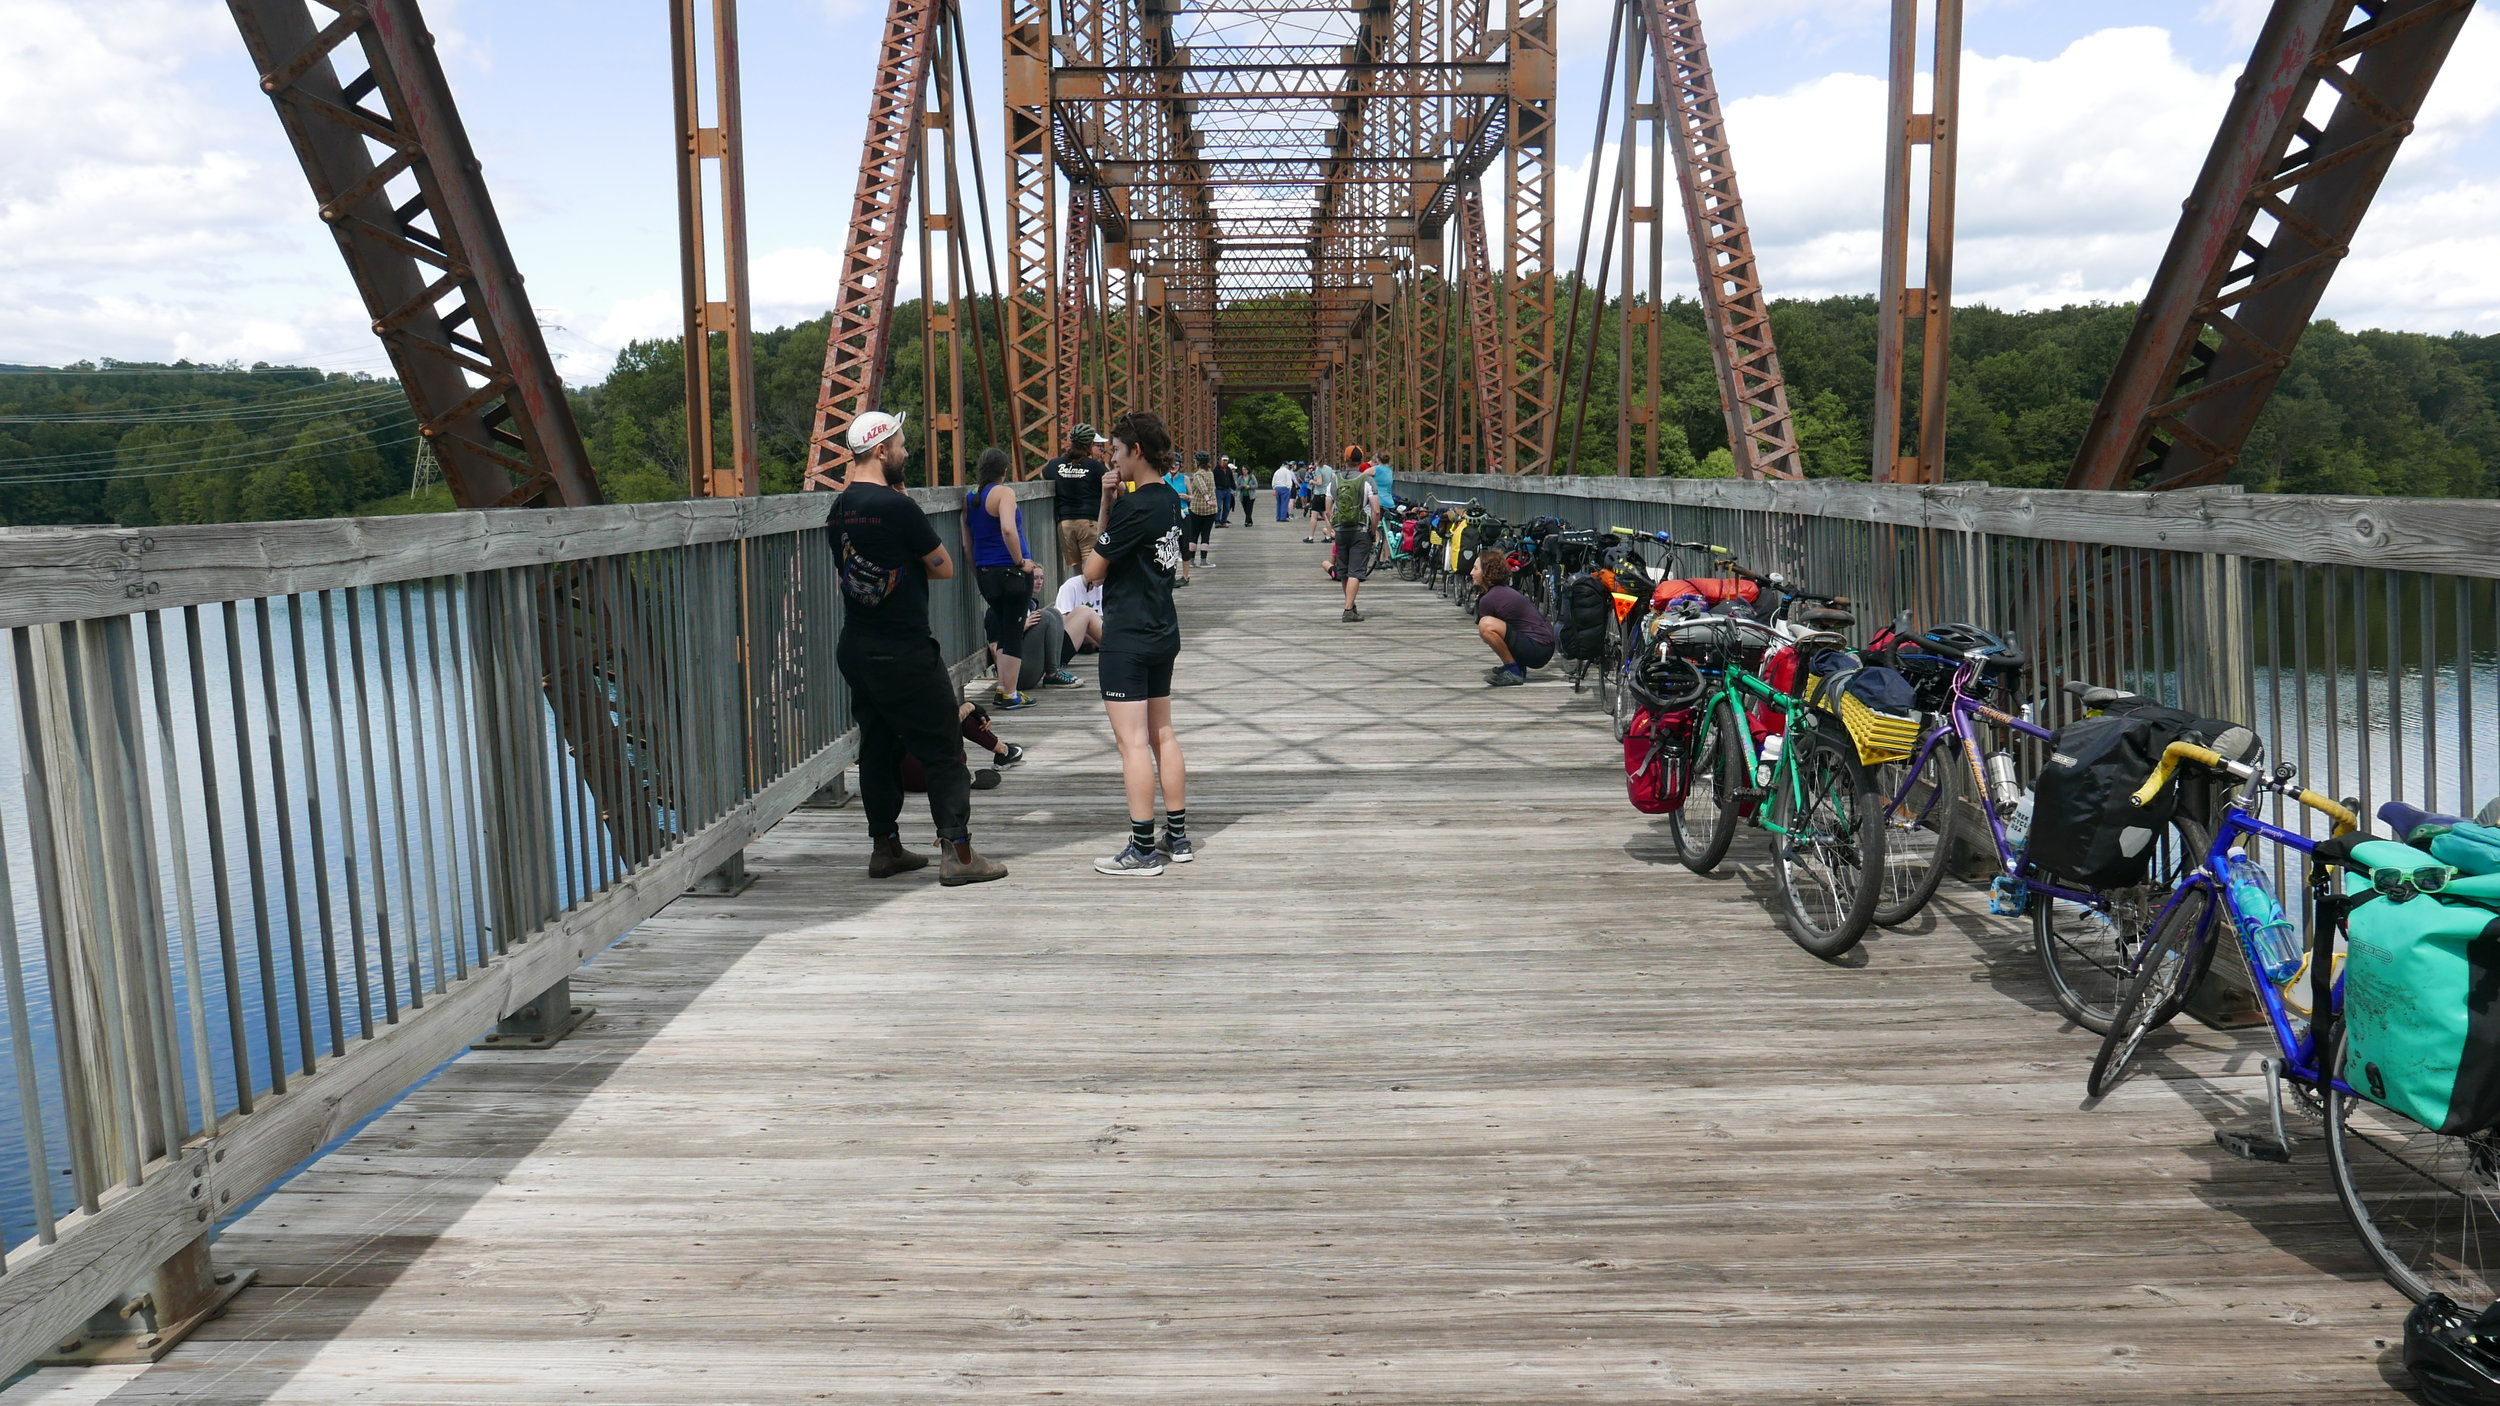 The Trestle bridge over the Croton Reservoir